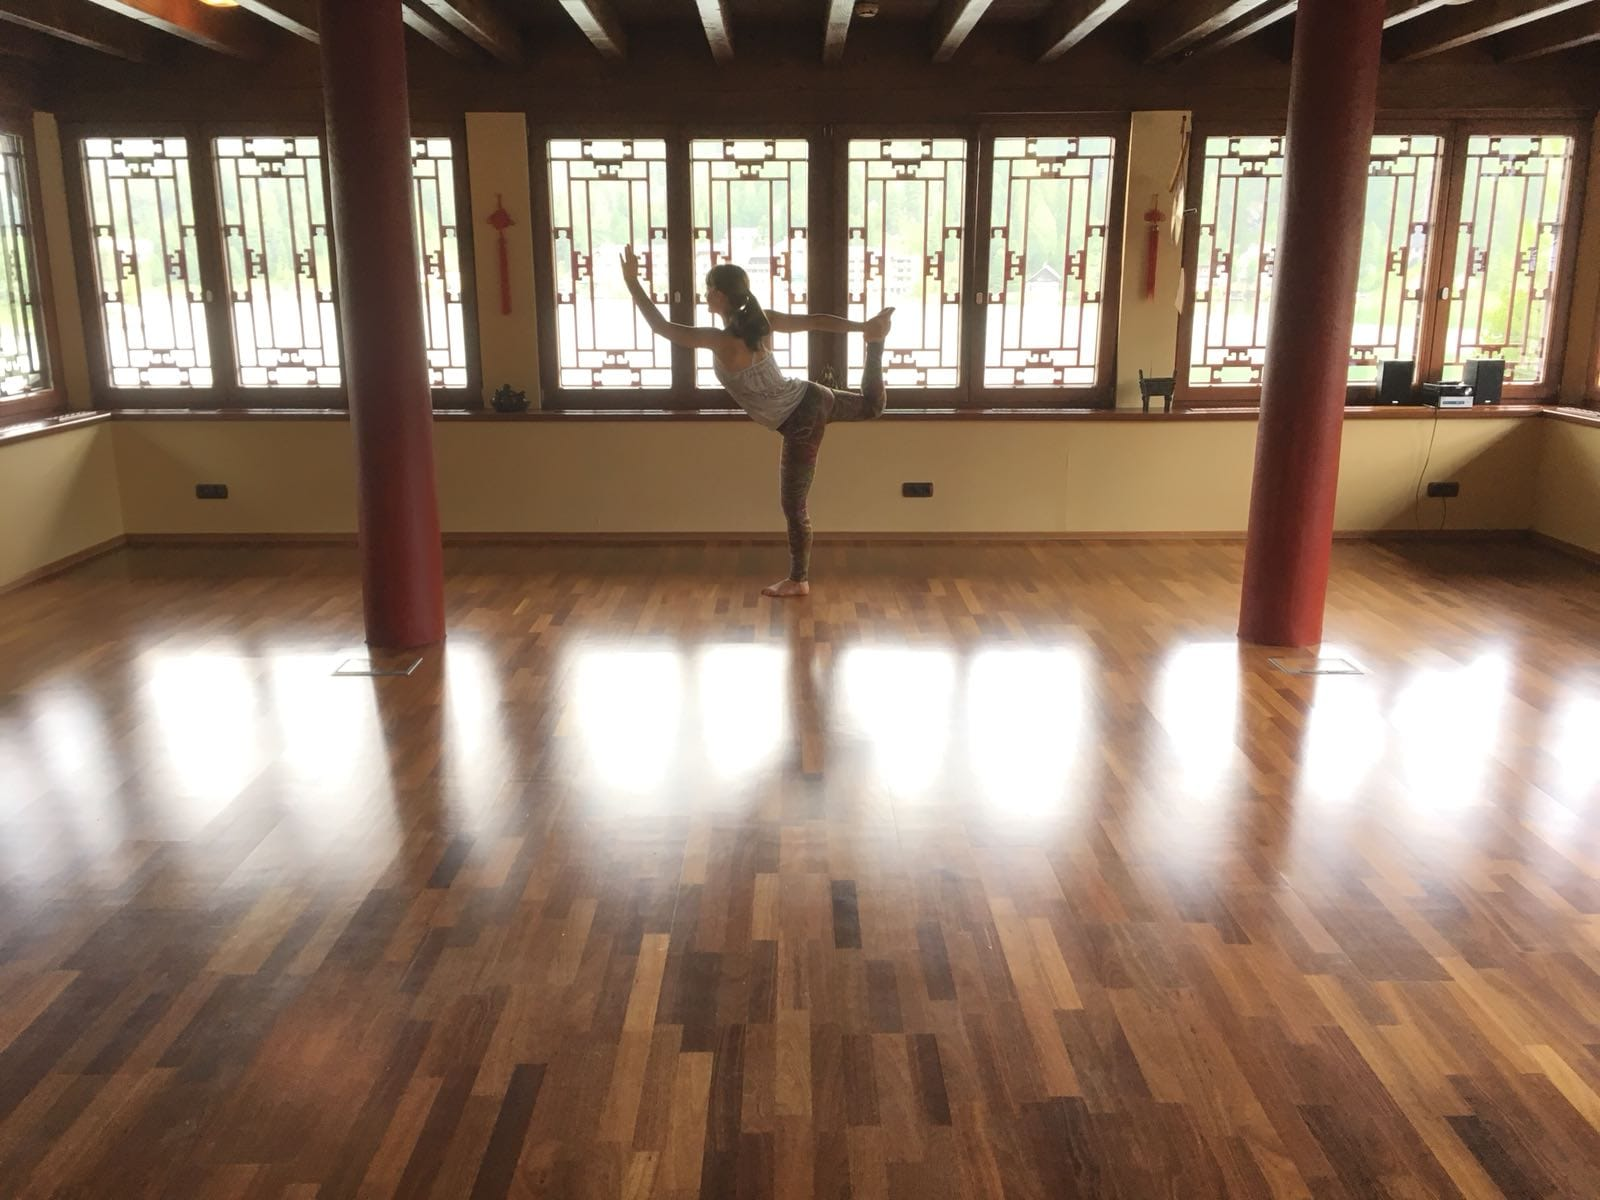 Fußboden Ideen Yoga ~ Yoga im hotel hochschober barefoot yoga urlaub